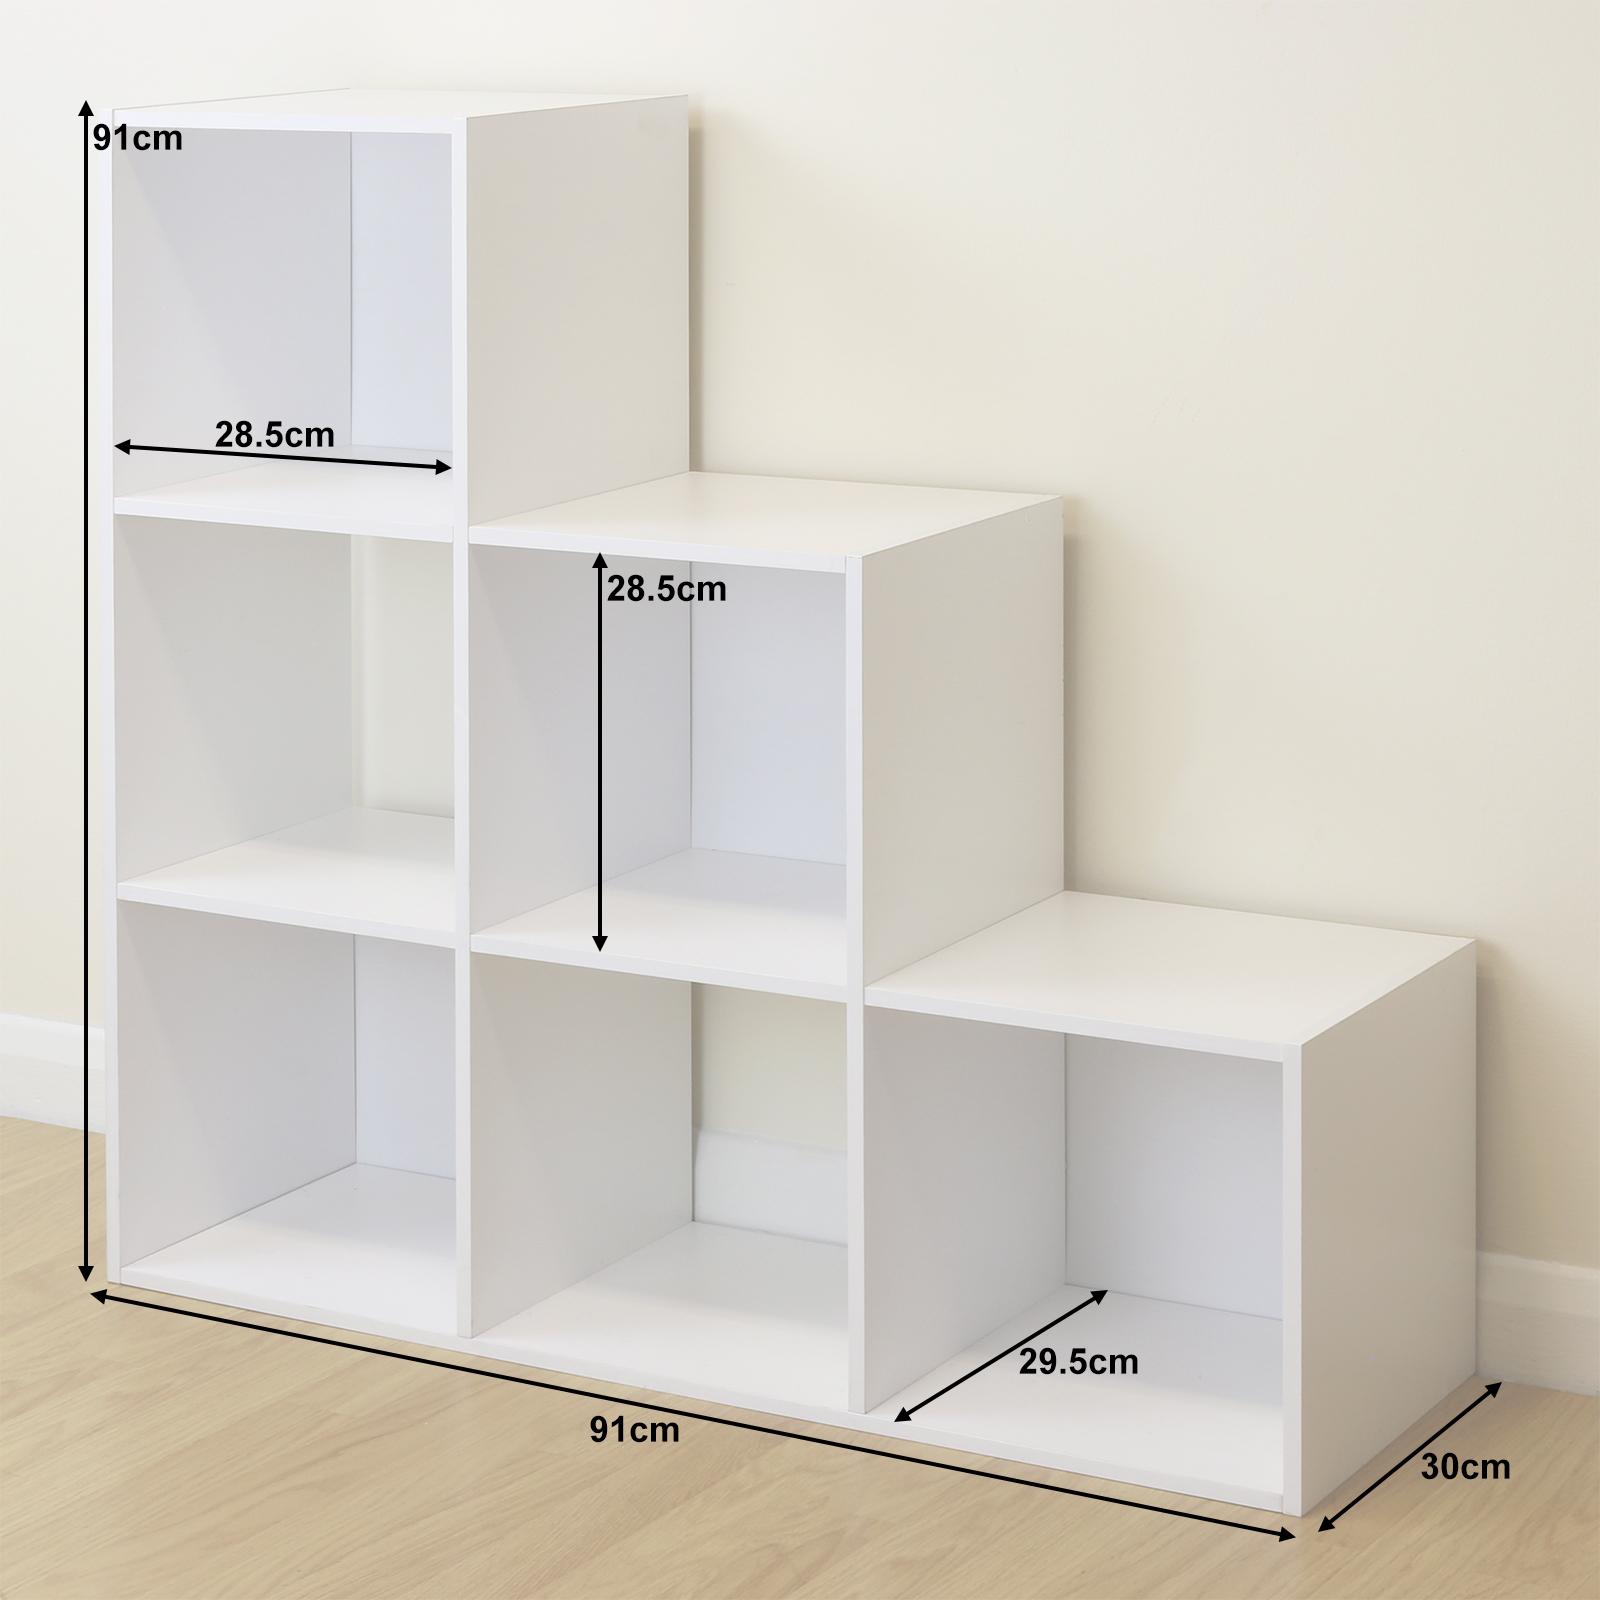 New Bookcase Toy Box White Finish Bedroom Playroom Child: White 6 Cube Kids Toy/Games Storage Unit Girls/Boys